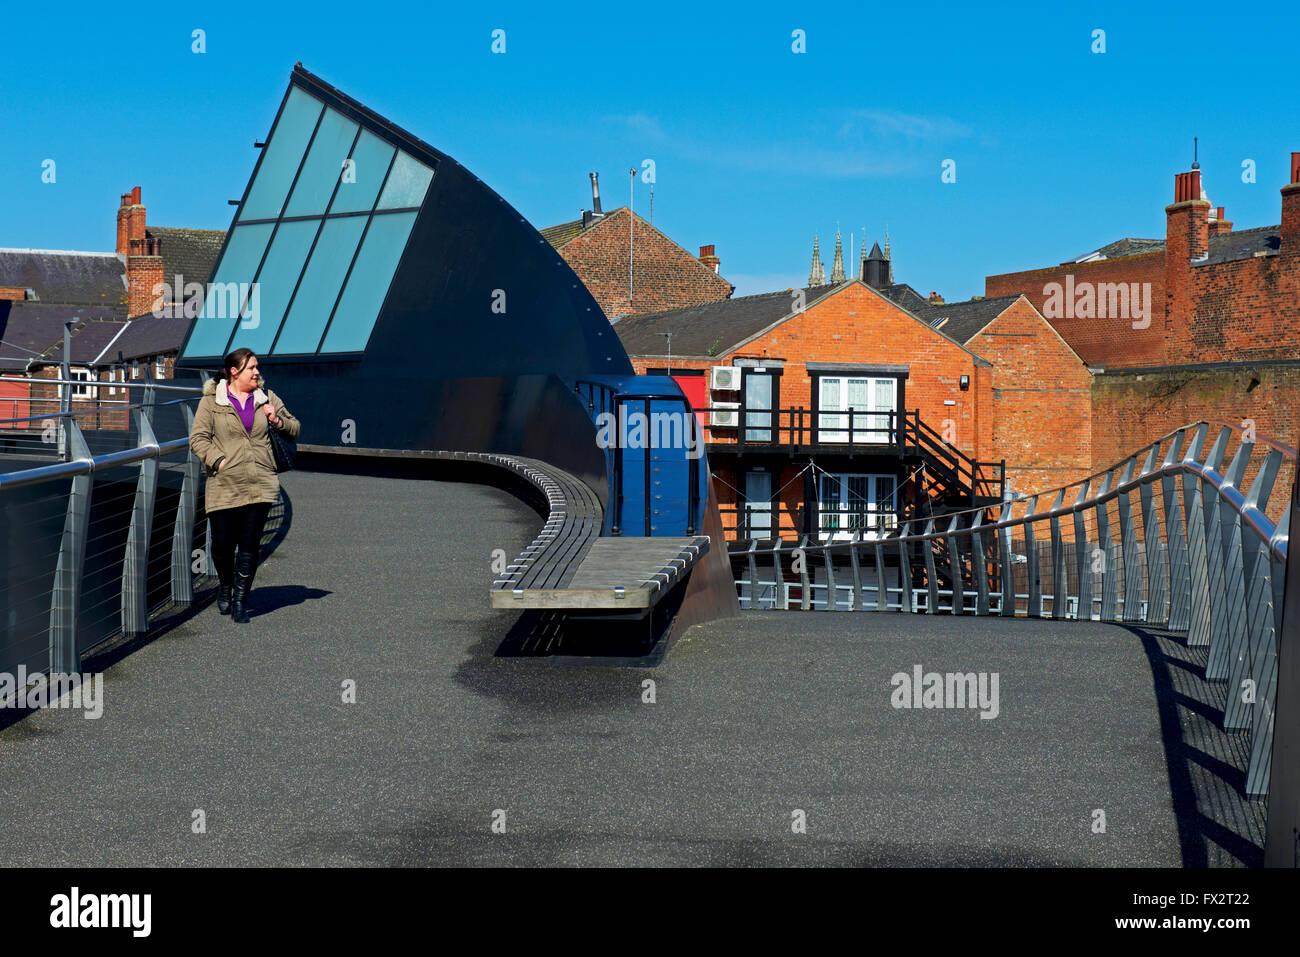 Woman walking on Scale Lane Bridge, Hull, East Riding of Yorkshire, Humberside, England UK - Stock Image